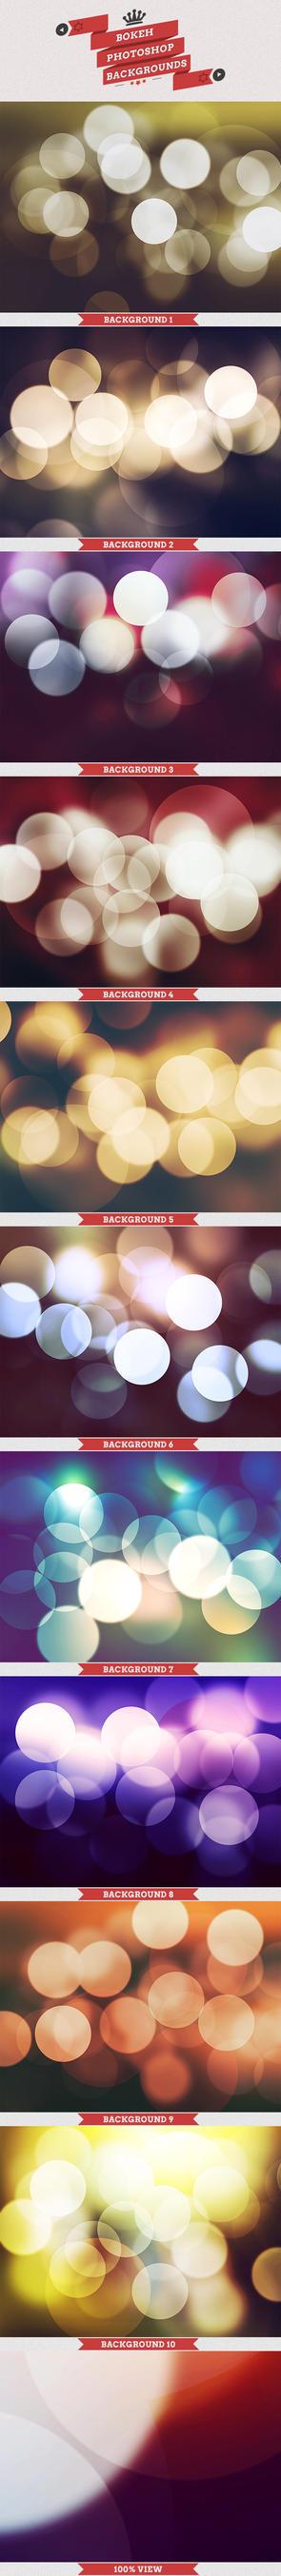 Bokeh Backgrounds by Base-Help